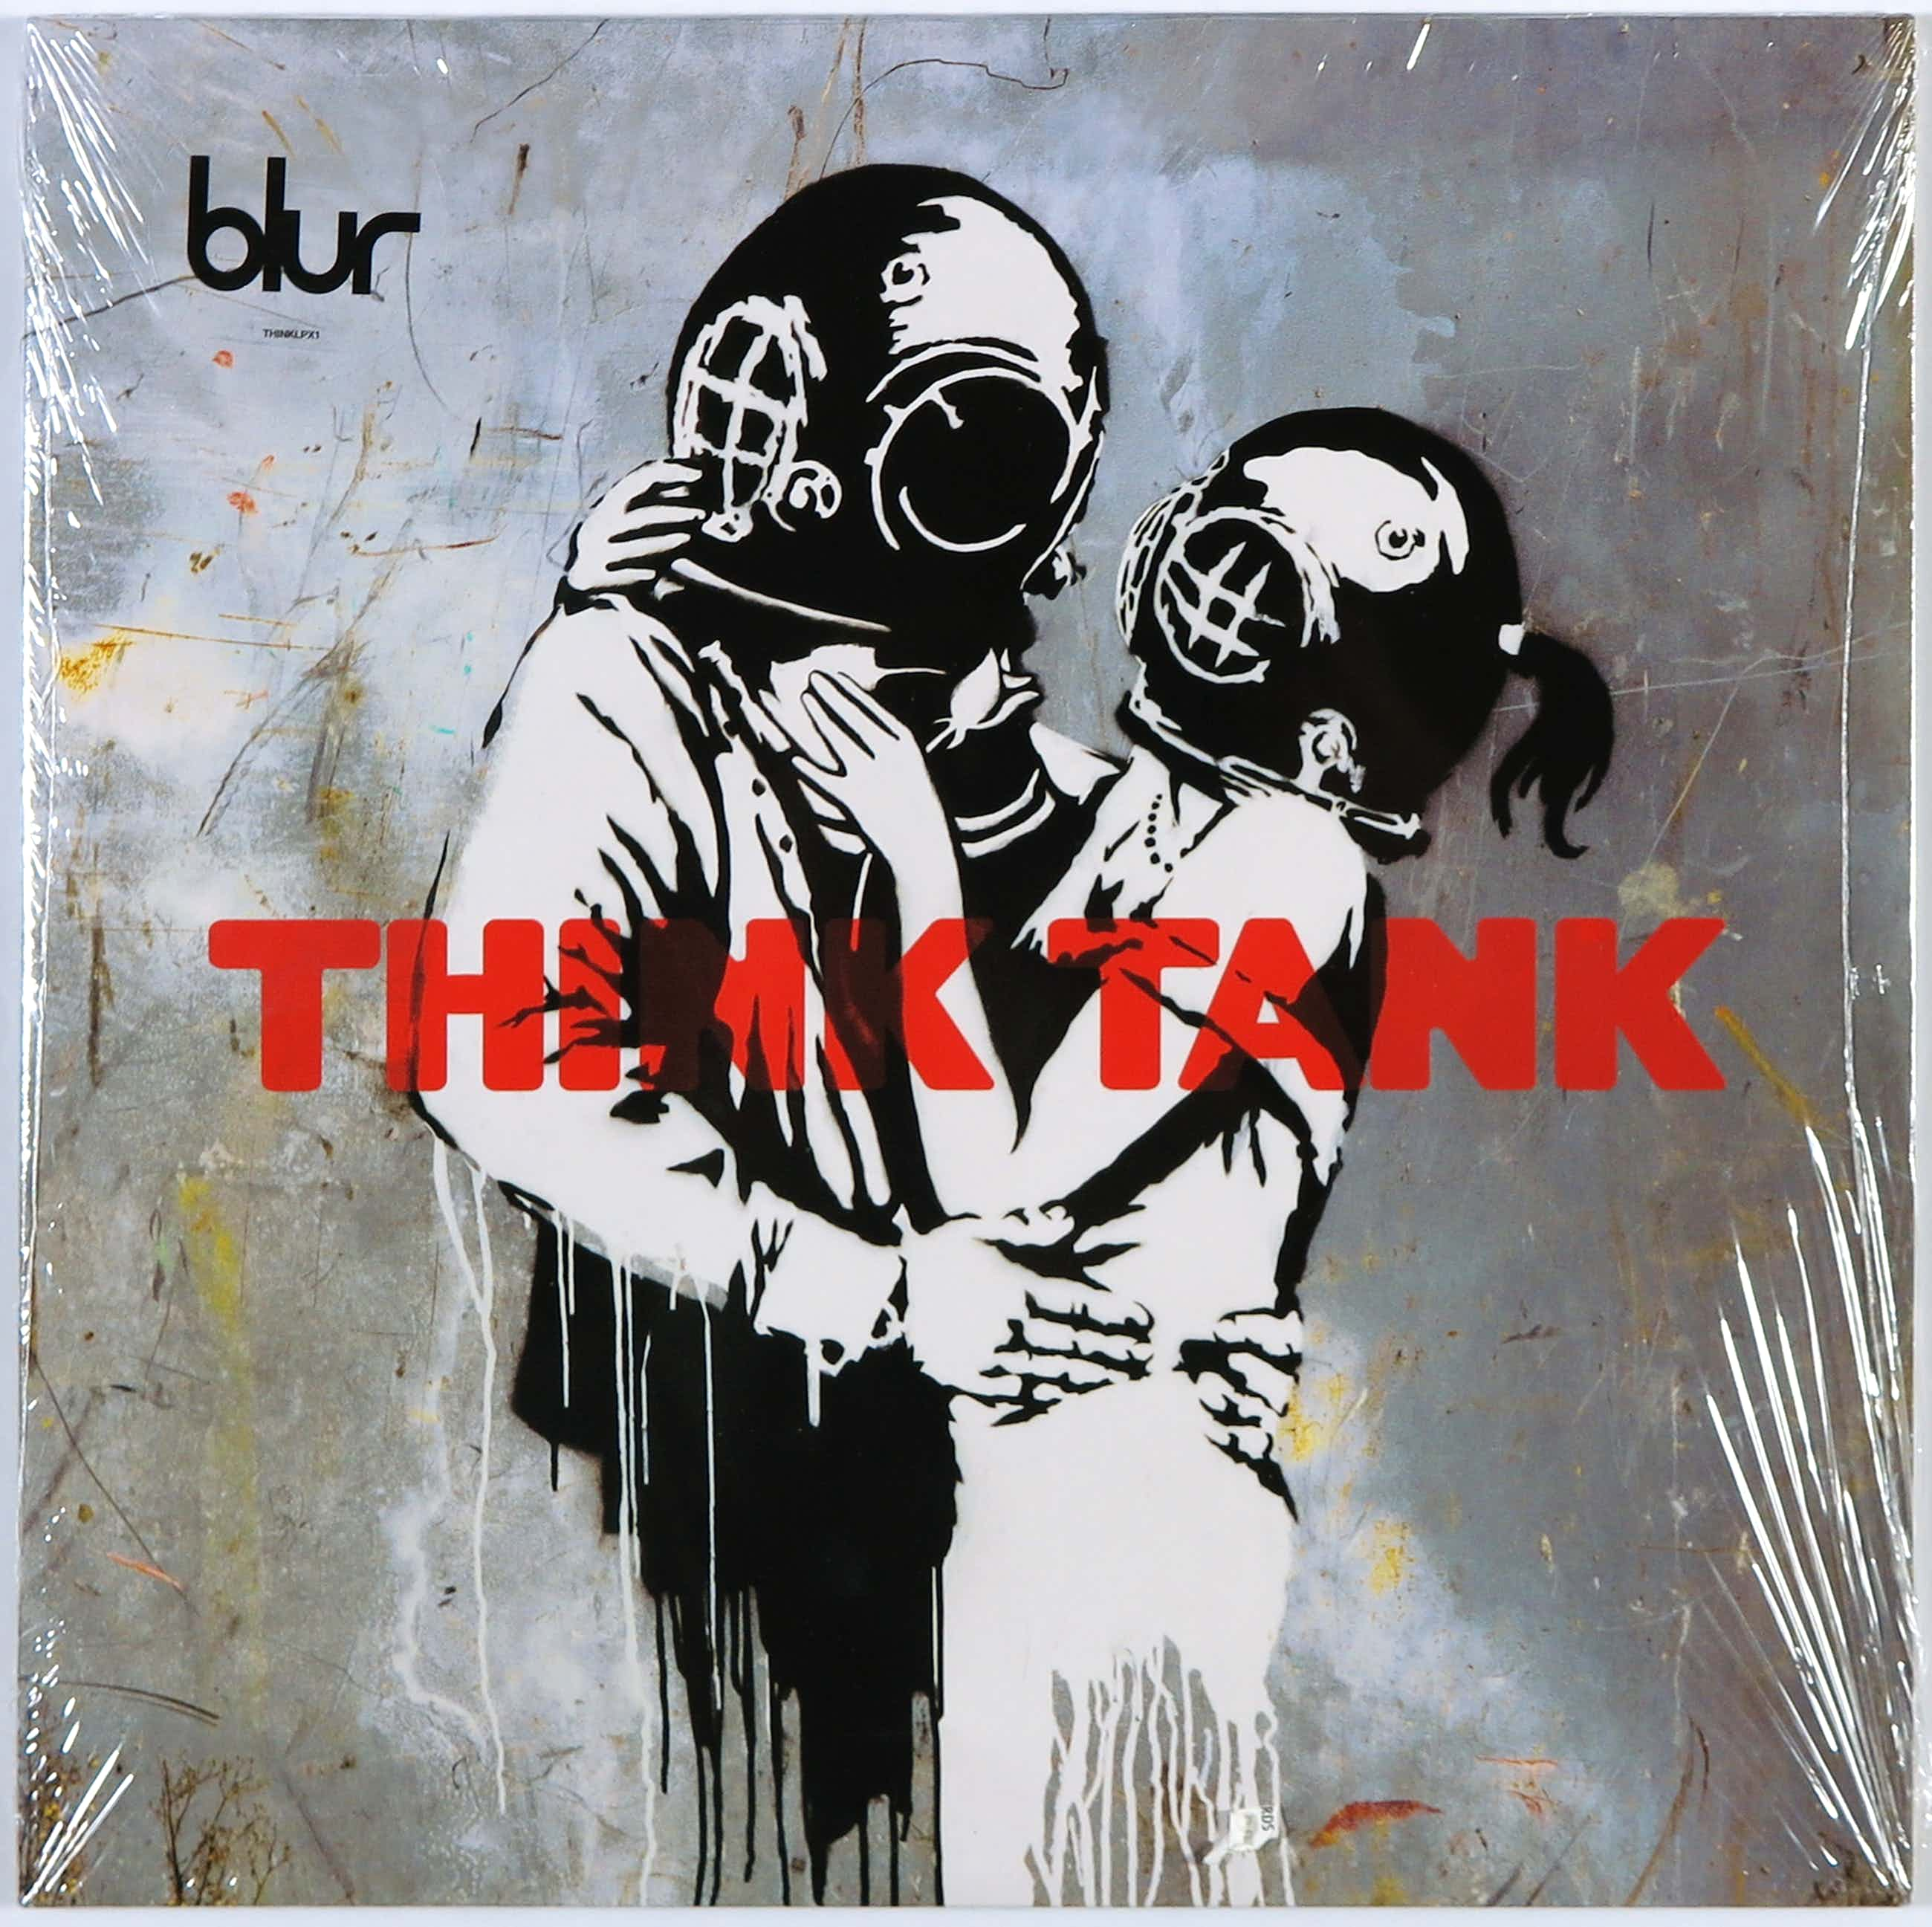 Banksy - Dubbel LP - Blur - Think Tank (Re-Issue) kopen? Bied vanaf 80!